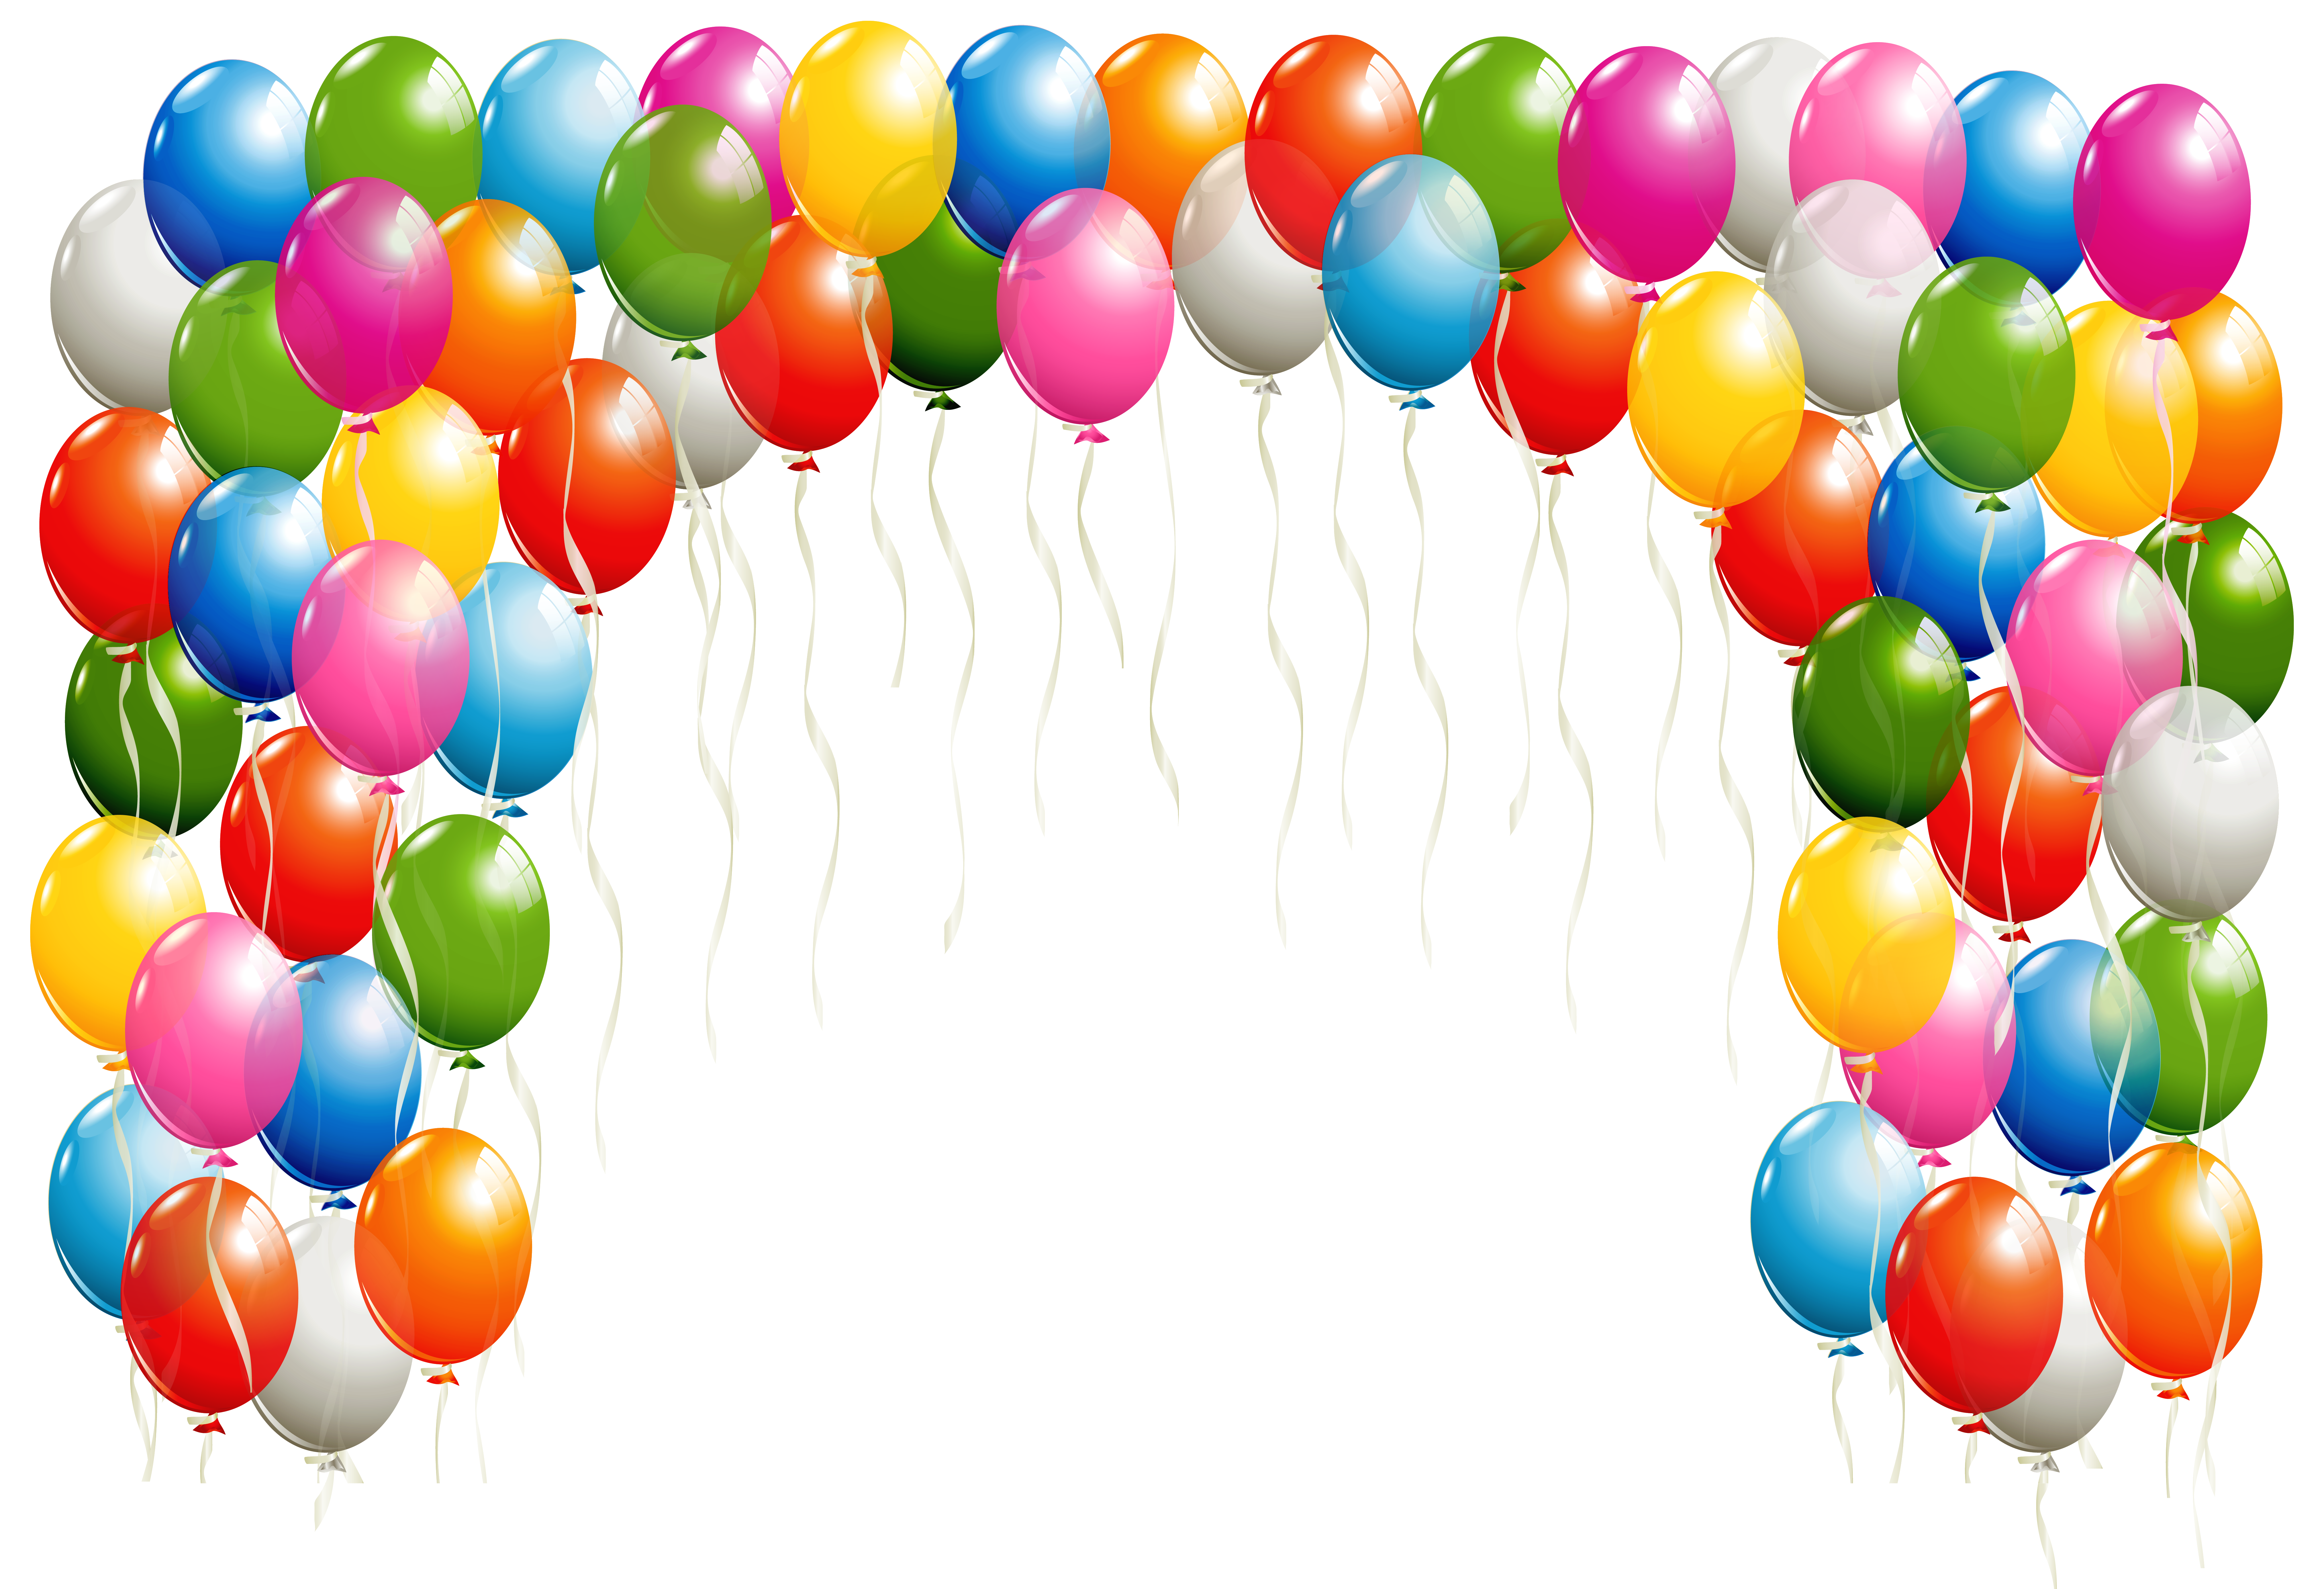 Transparent balloons arch image. Clipart balloon elegant